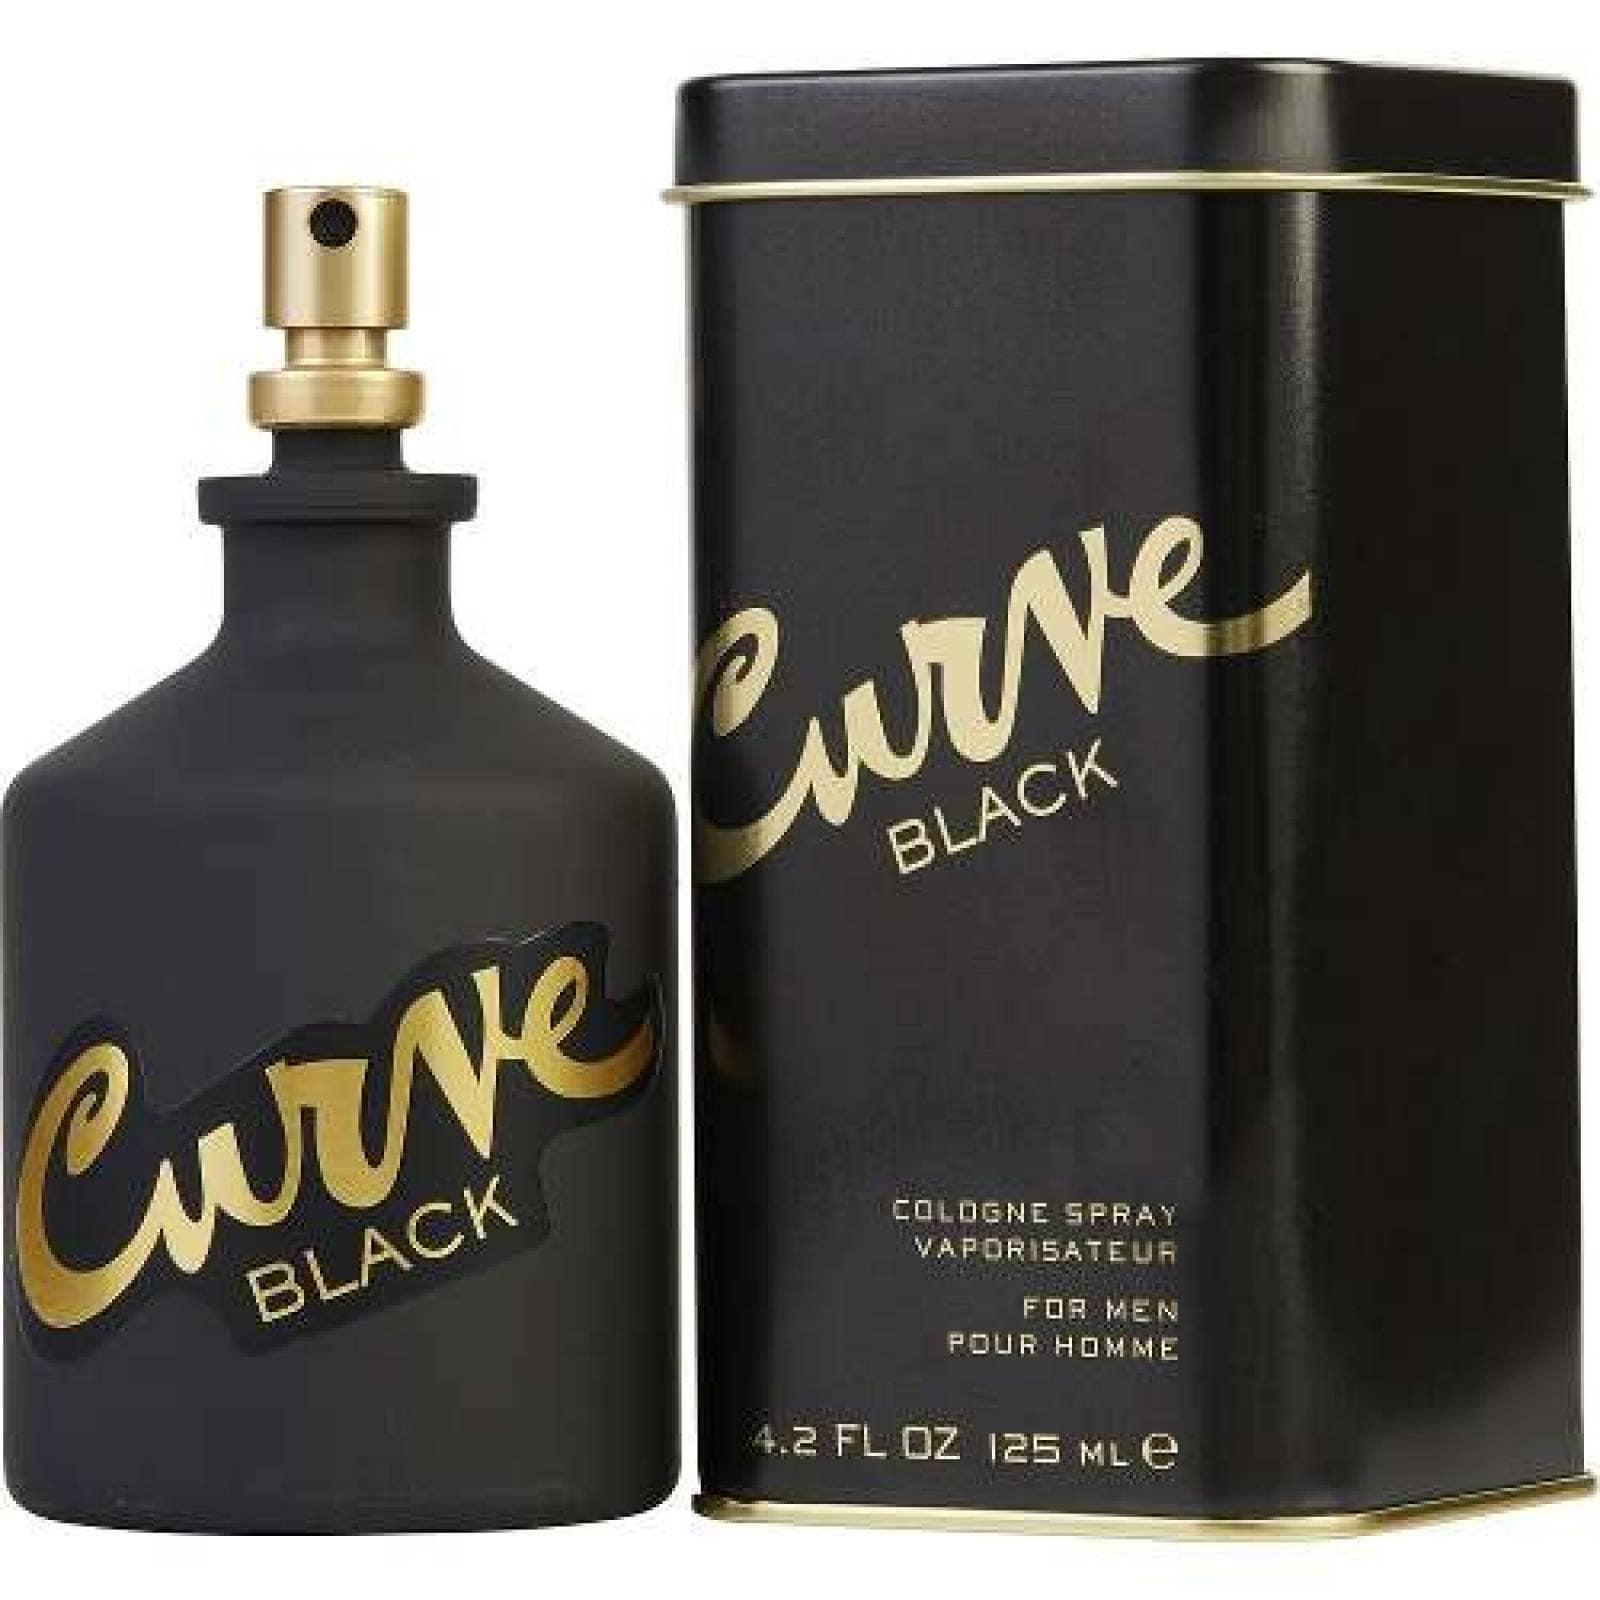 Curve Black Caballero 125 Ml Liz Claiborne Edt Spray